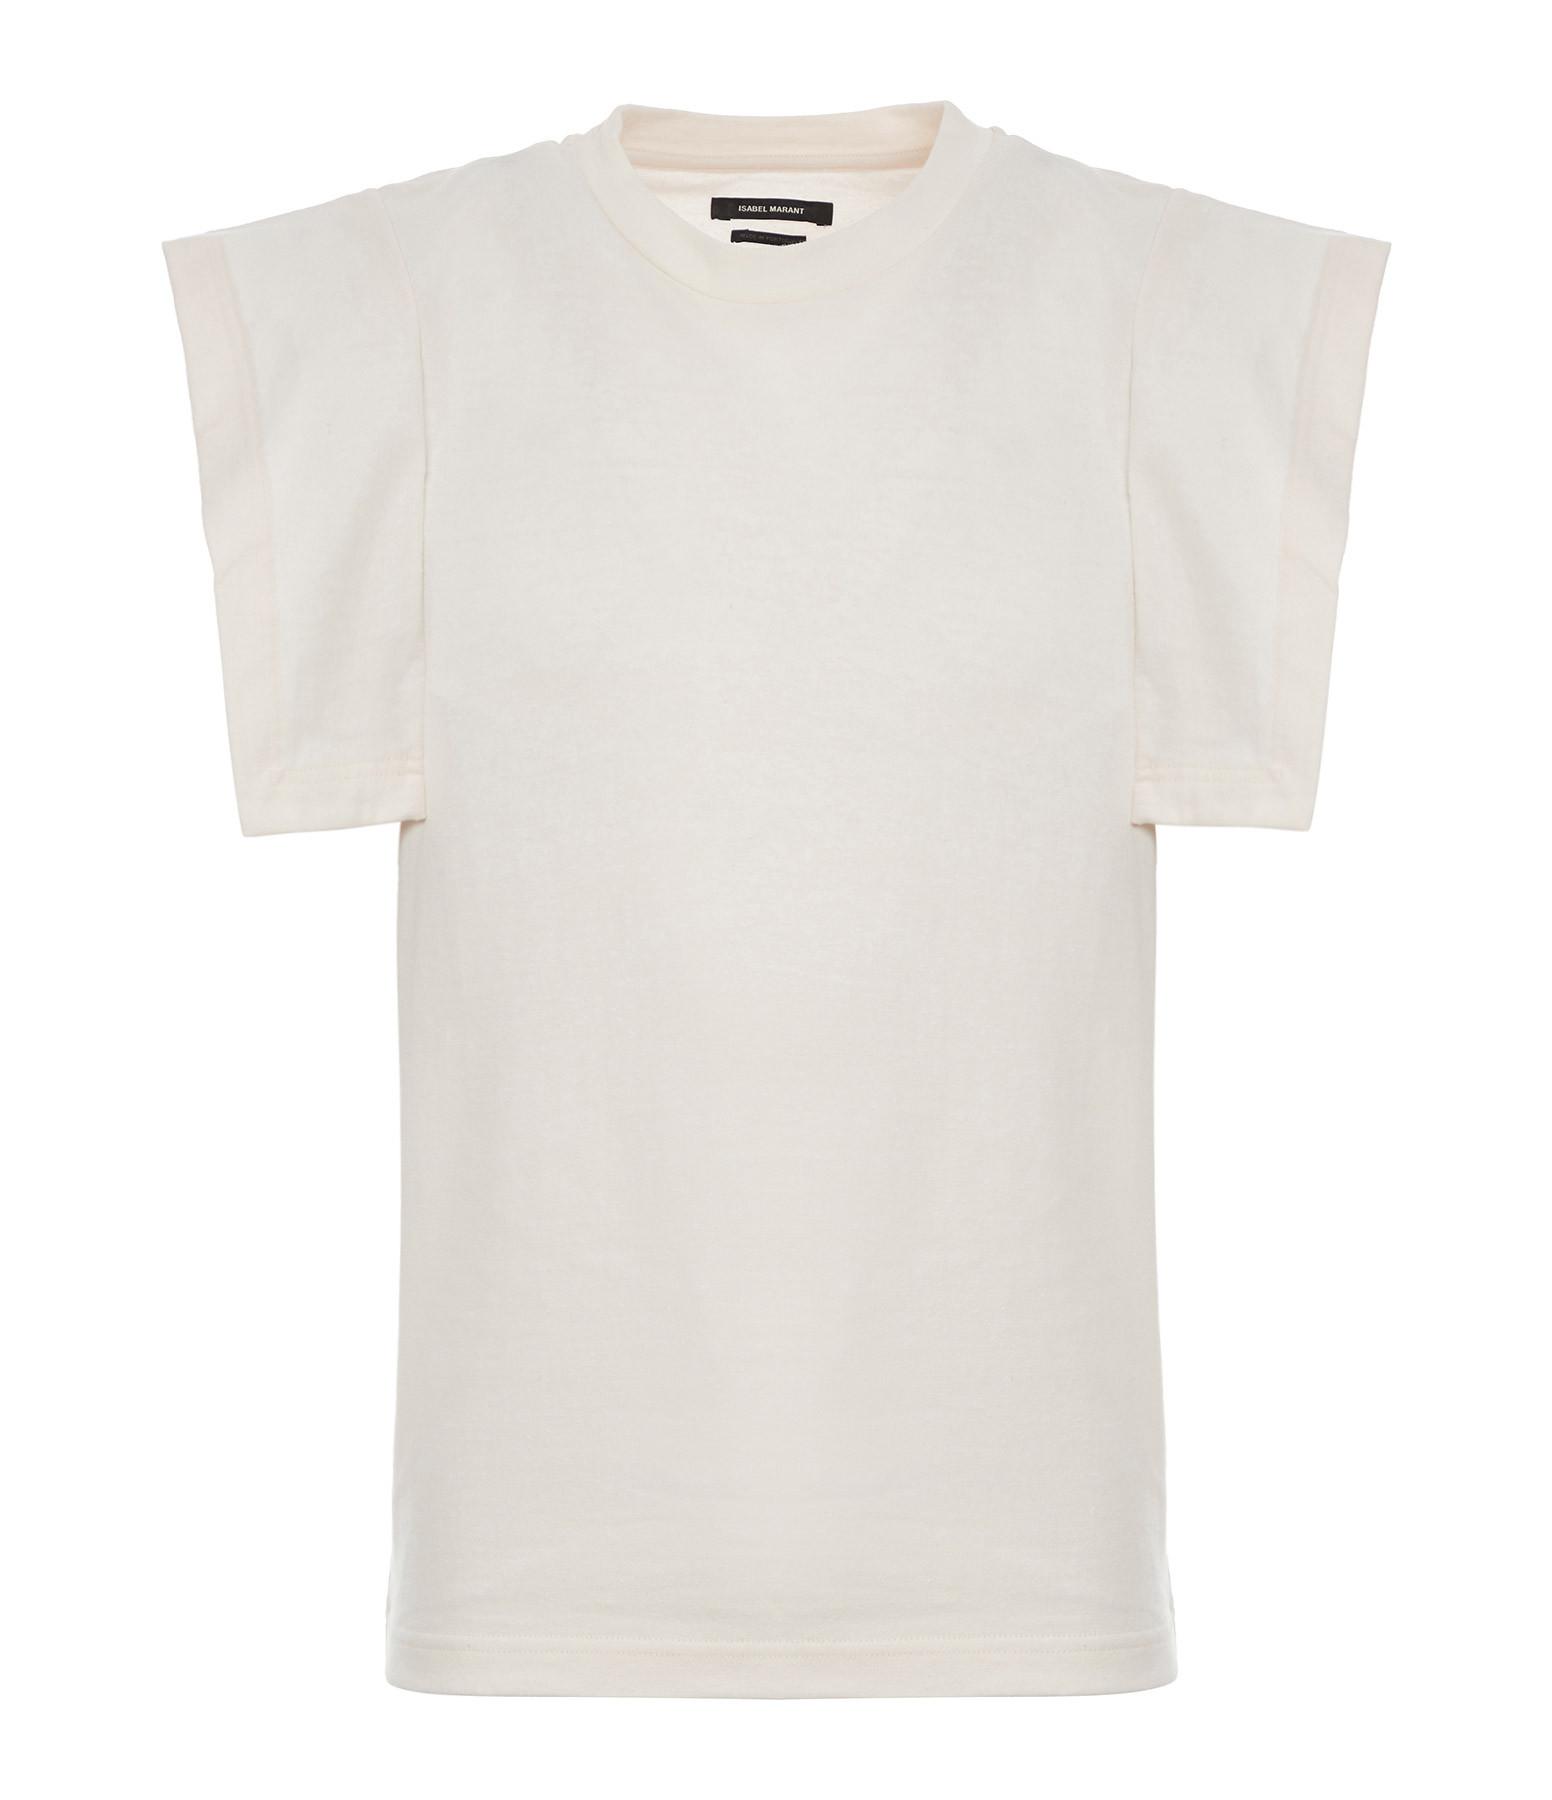 ISABEL MARANT - Tee-shirt Zelipa Coton Écru